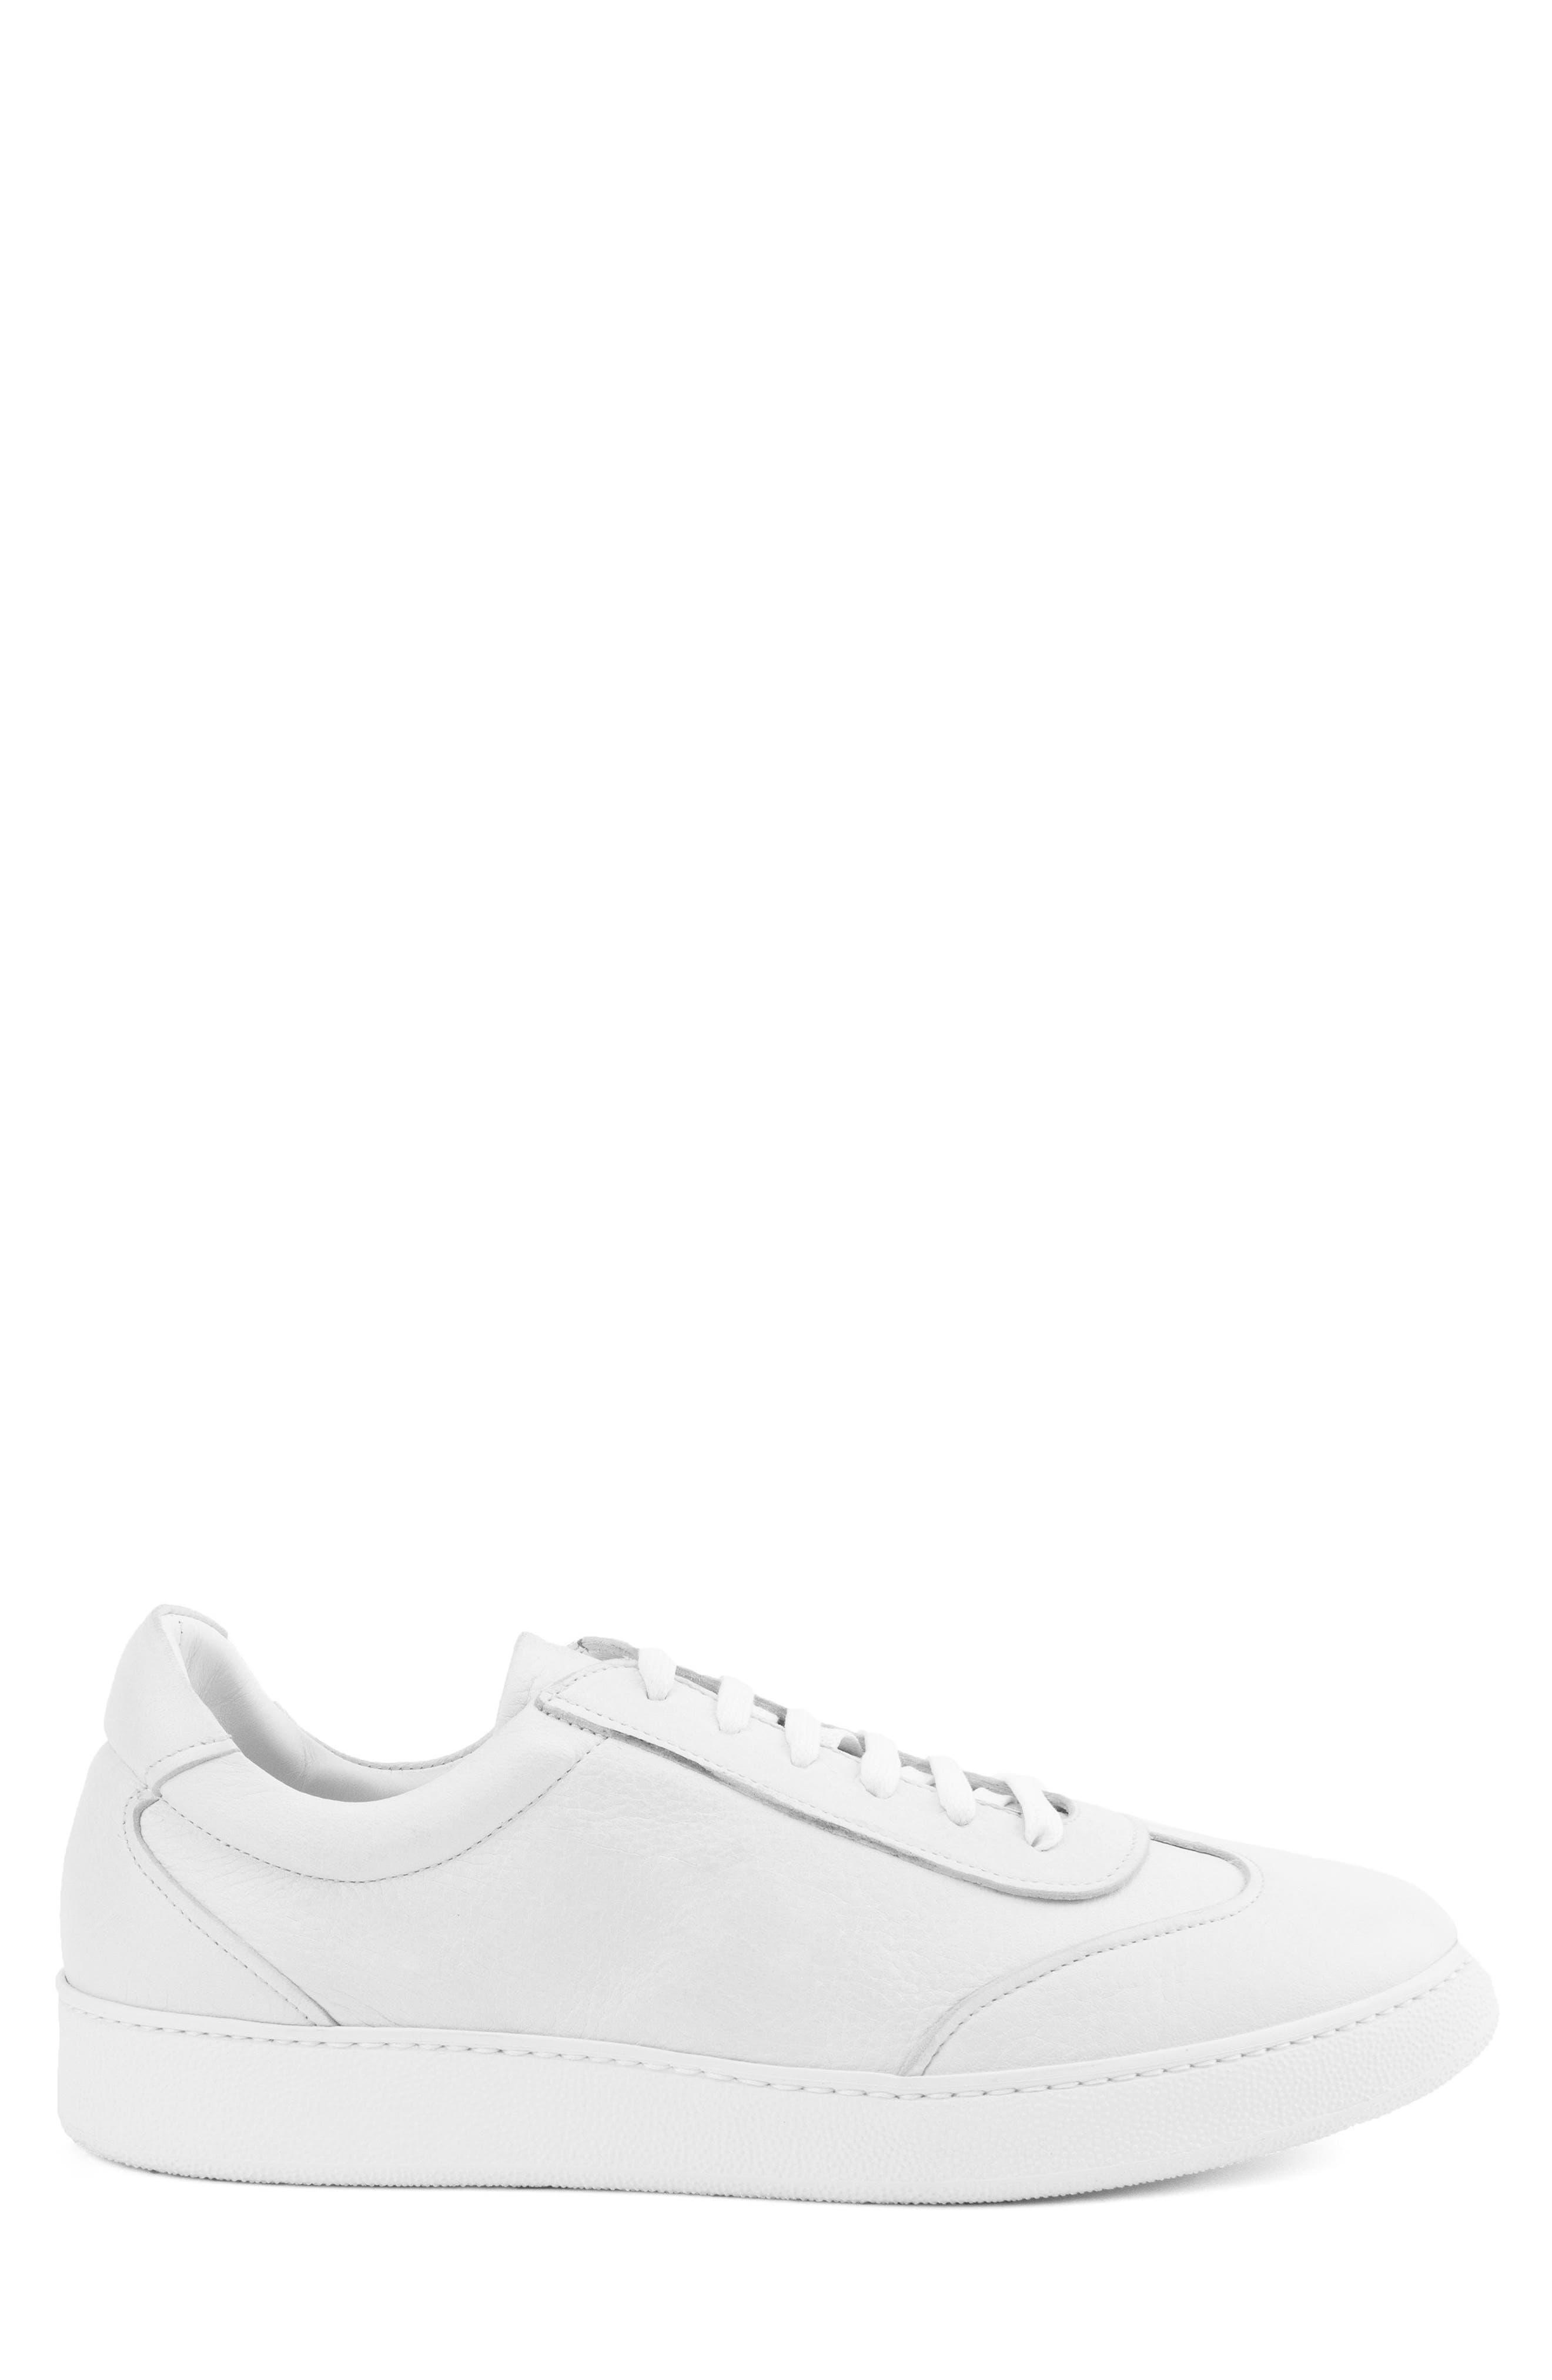 Tristan Sneaker,                             Alternate thumbnail 3, color,                             WHITE LEATHER